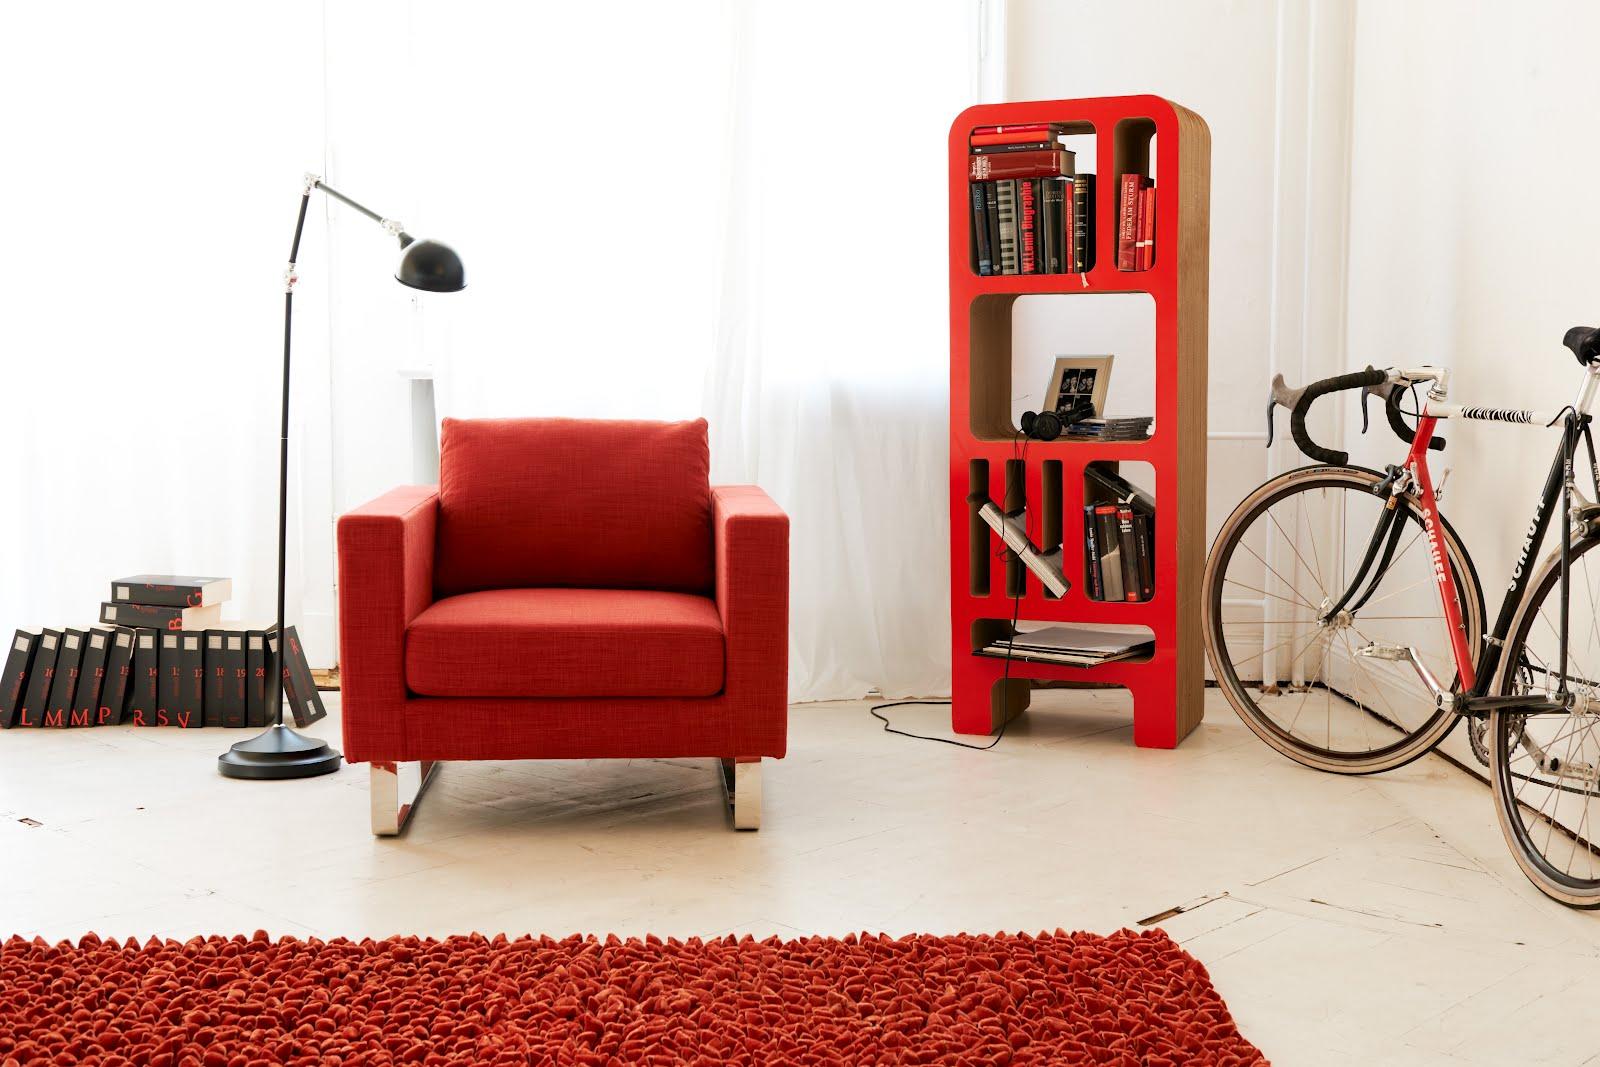 interior design ideas some affordable furniture design collections. Black Bedroom Furniture Sets. Home Design Ideas